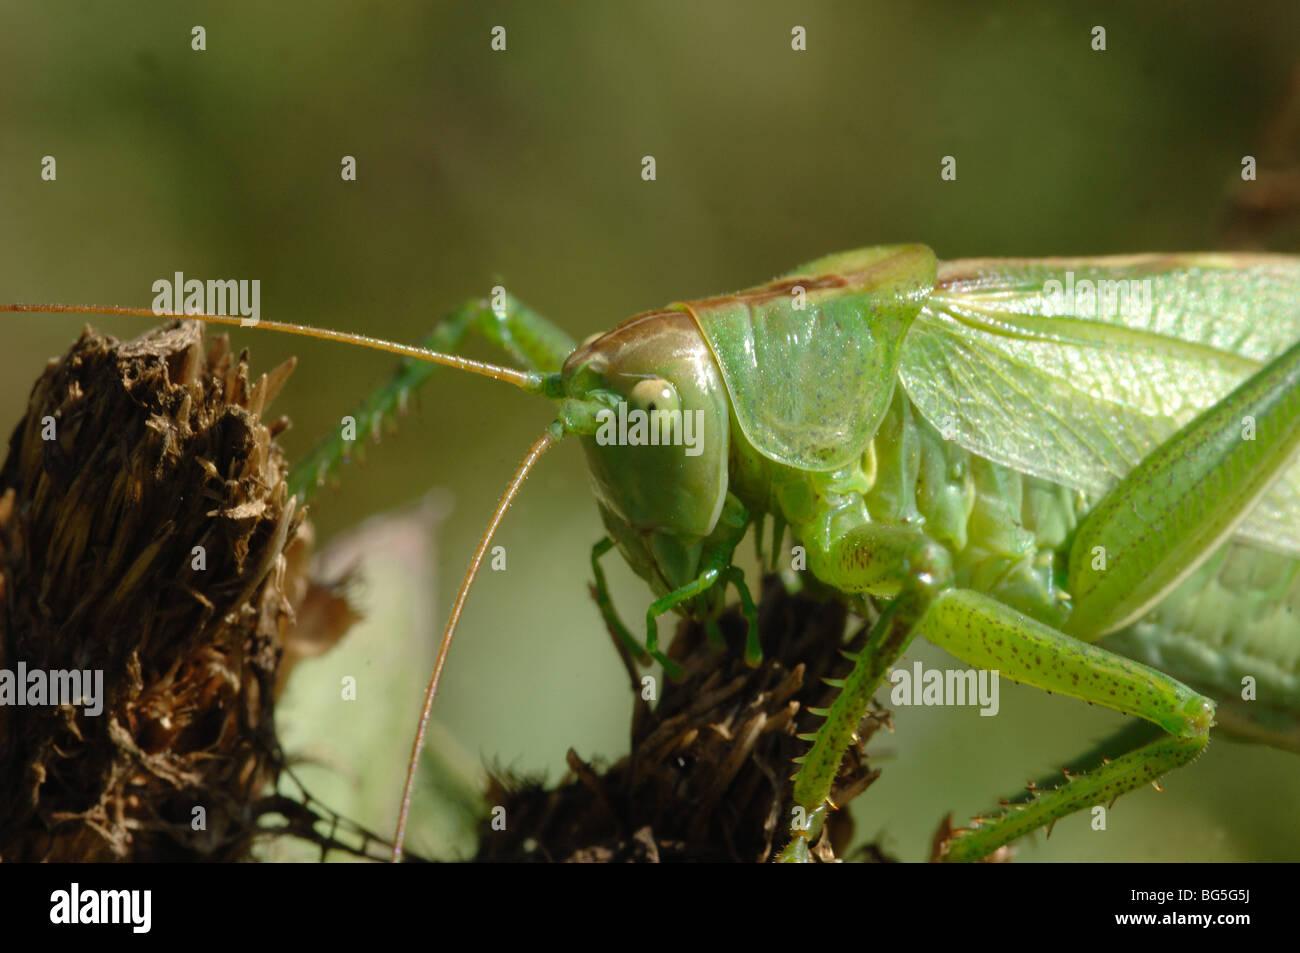 Große grüne Bush Cricket - Tettigonia Viridissima im Nationalpark Mala Fatra Slowakei Stockbild